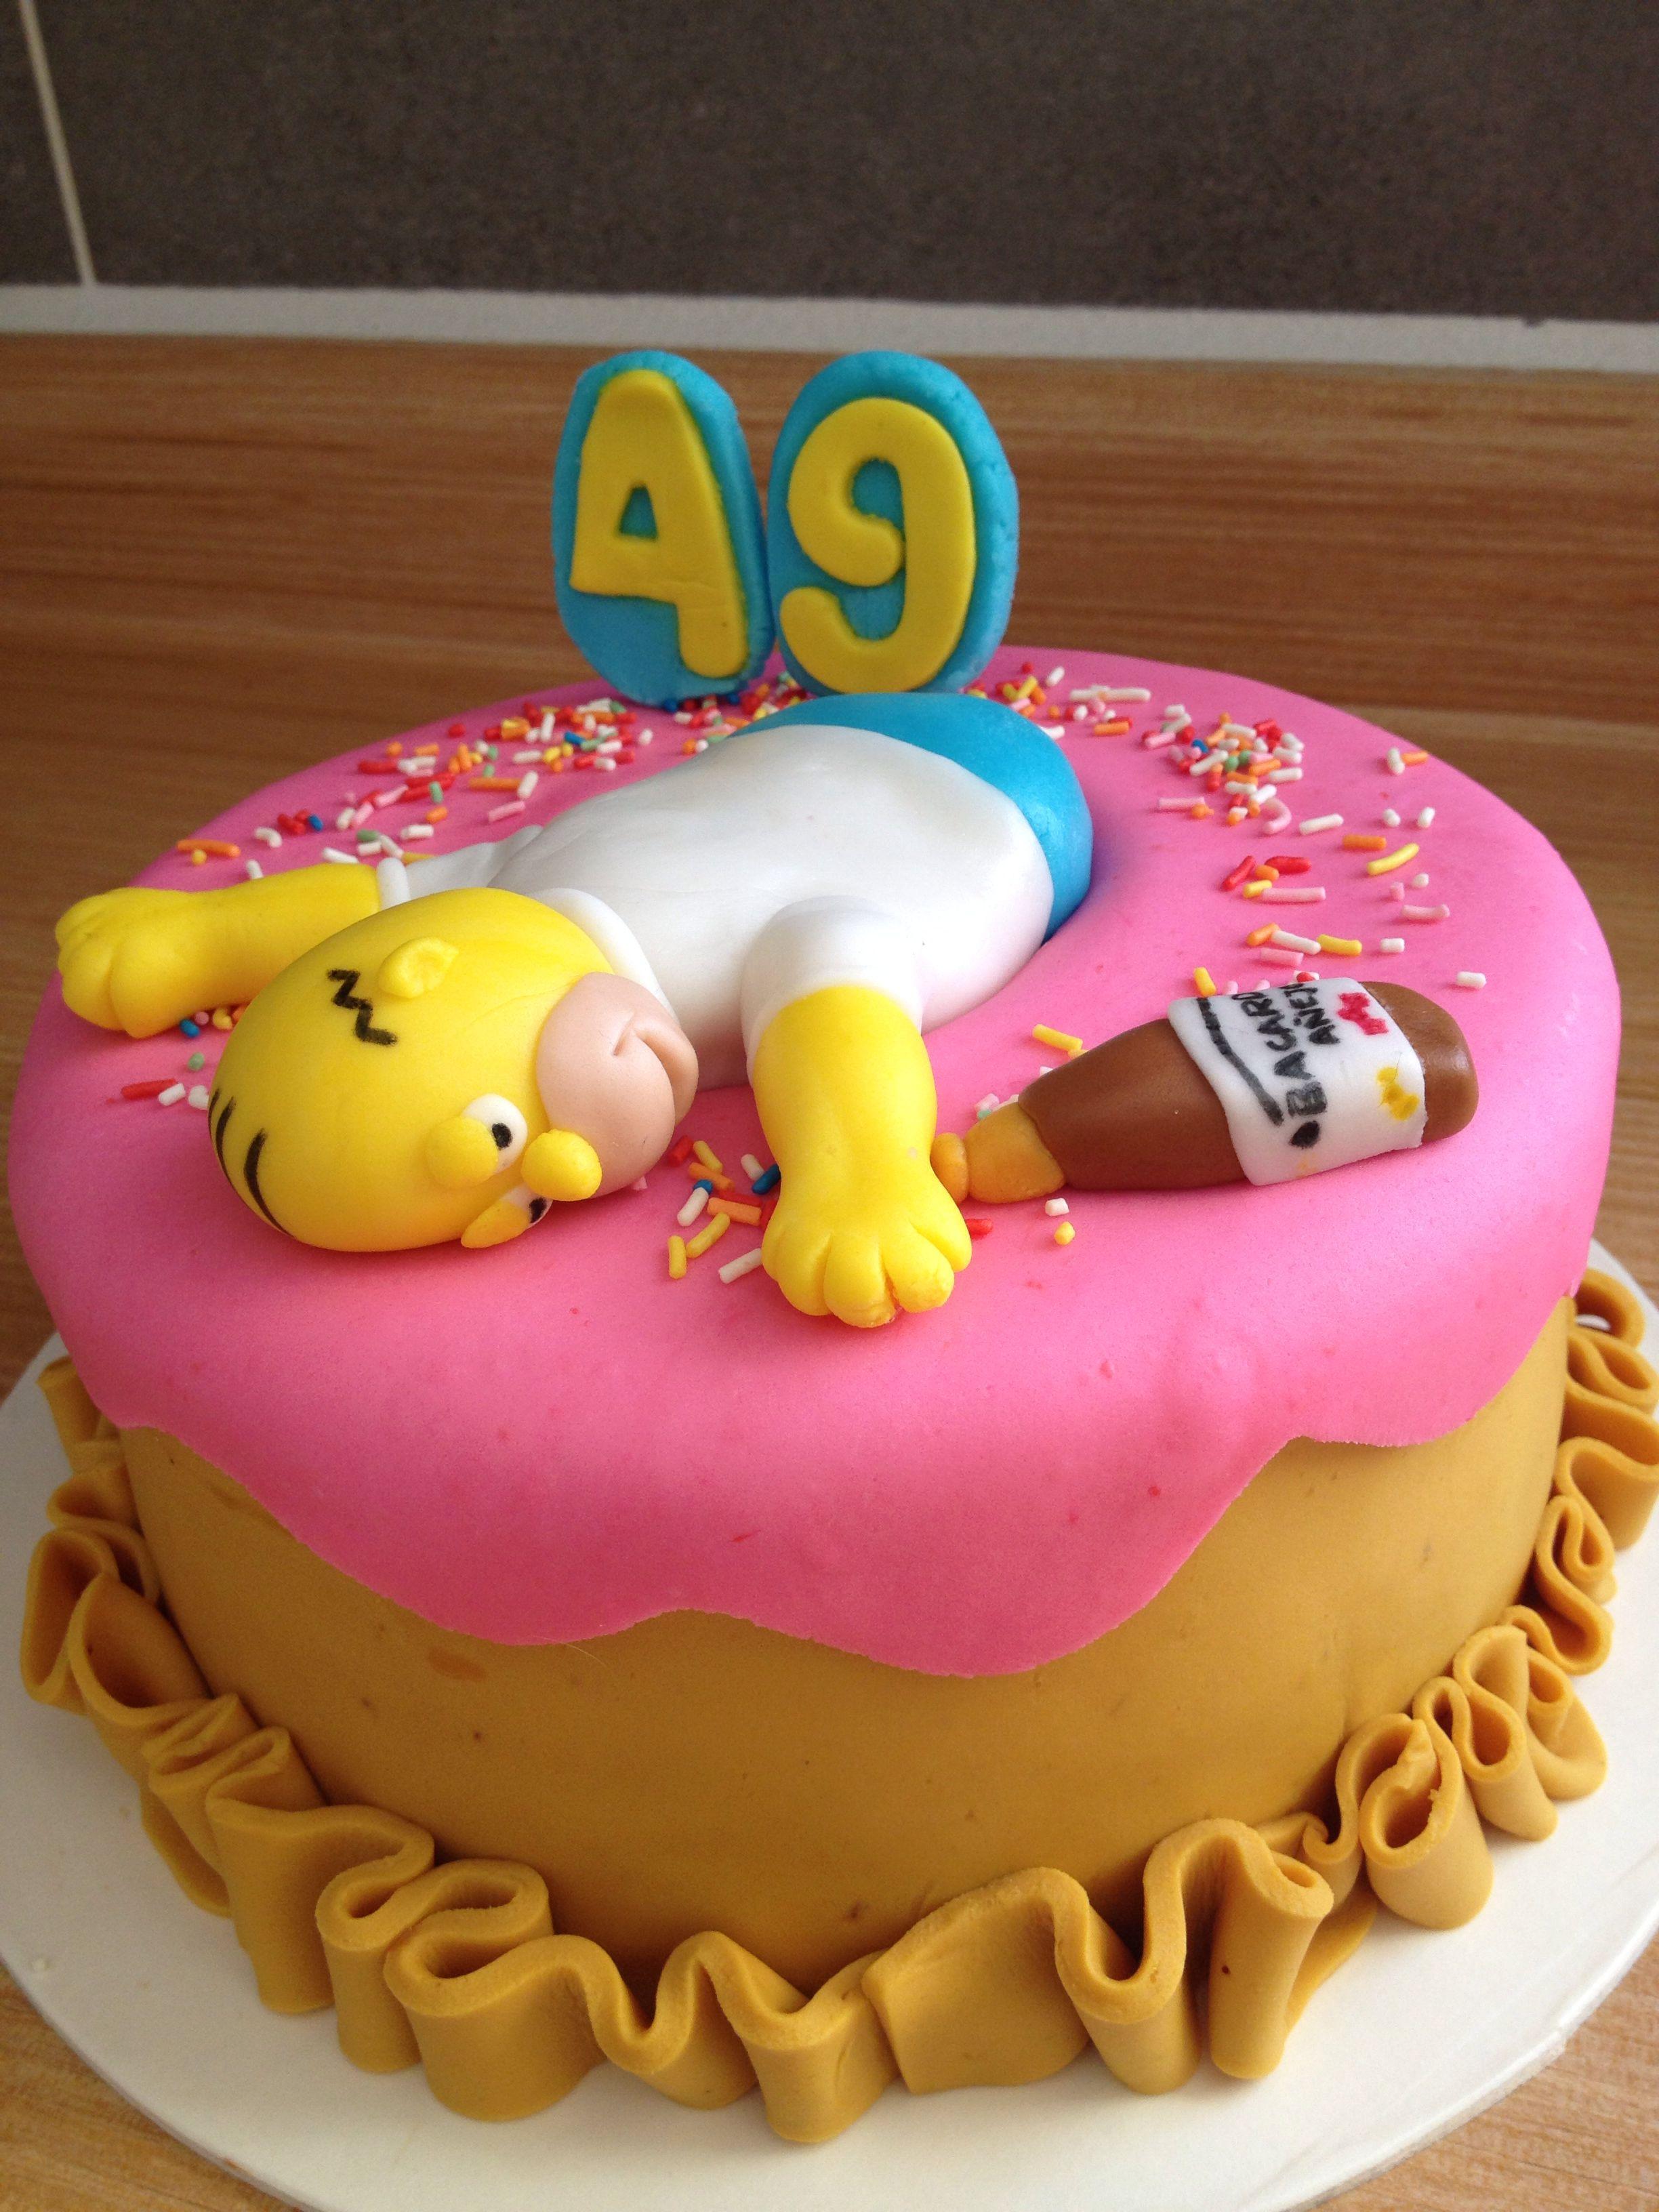 Homero simpson cake   My work in 2018   Pinterest   Cake, Dad cake ...